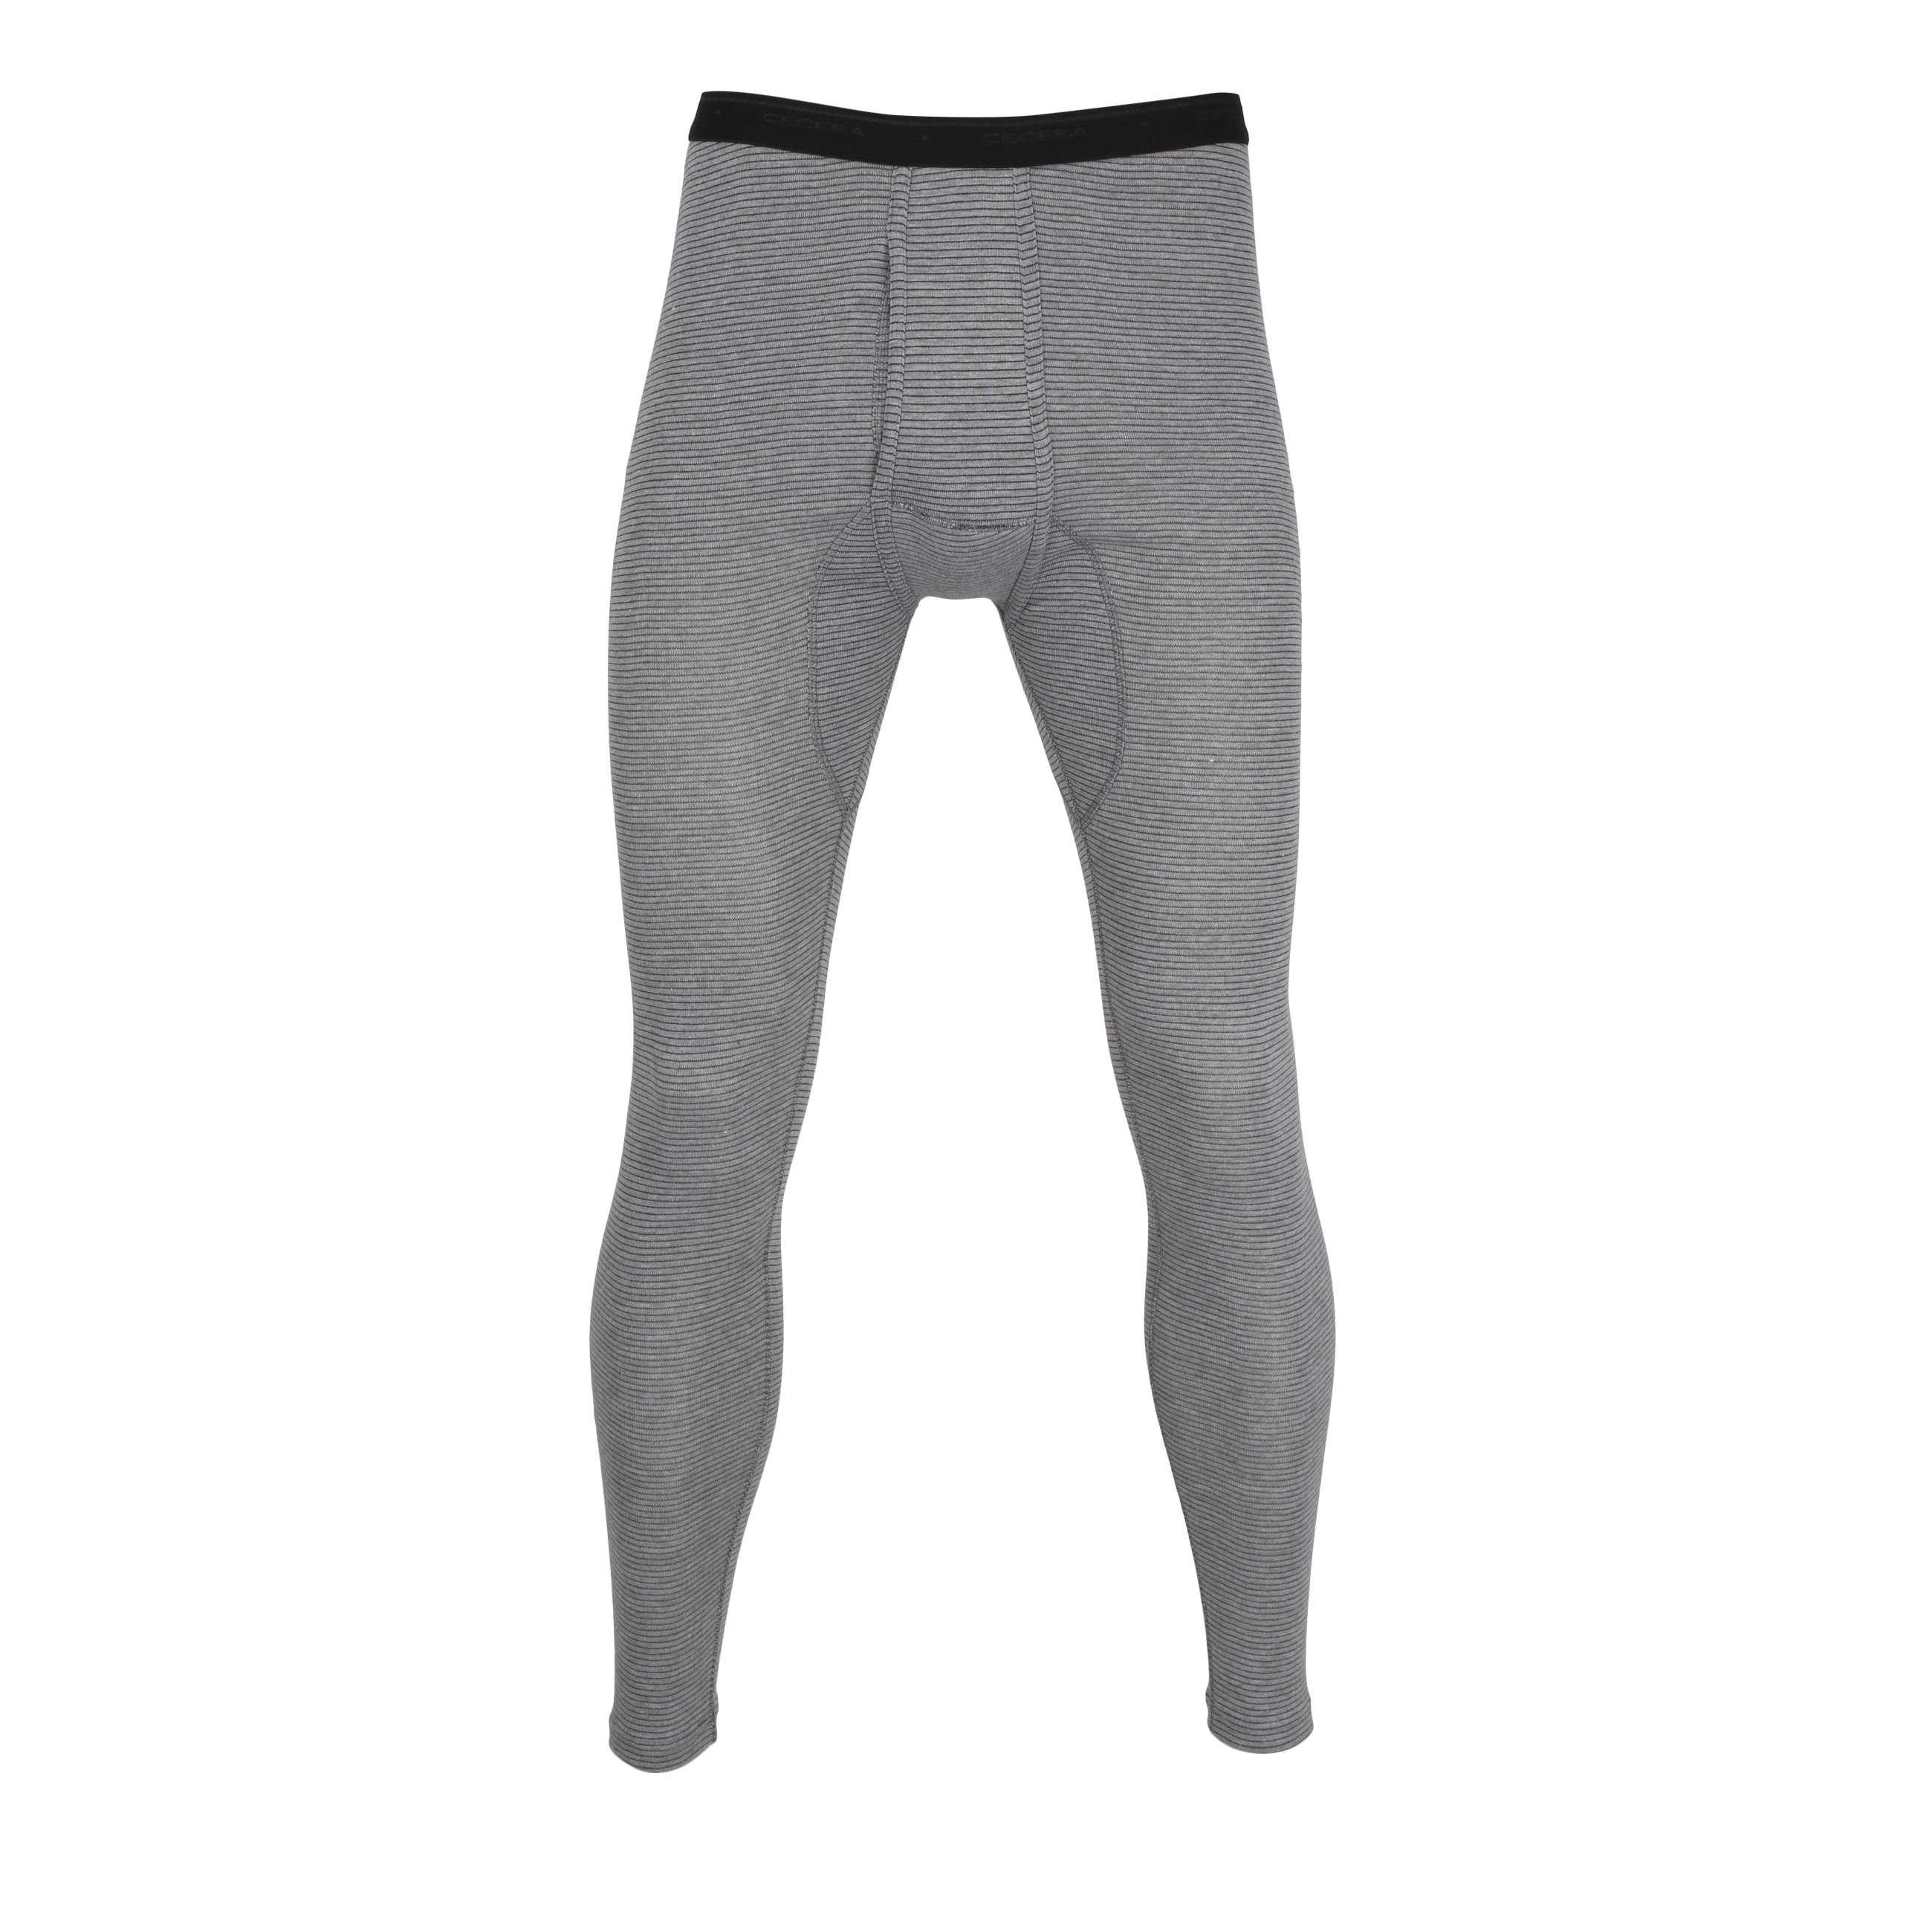 ceceba herren lange unterhose mit eingriff grau uni 1er pack. Black Bedroom Furniture Sets. Home Design Ideas